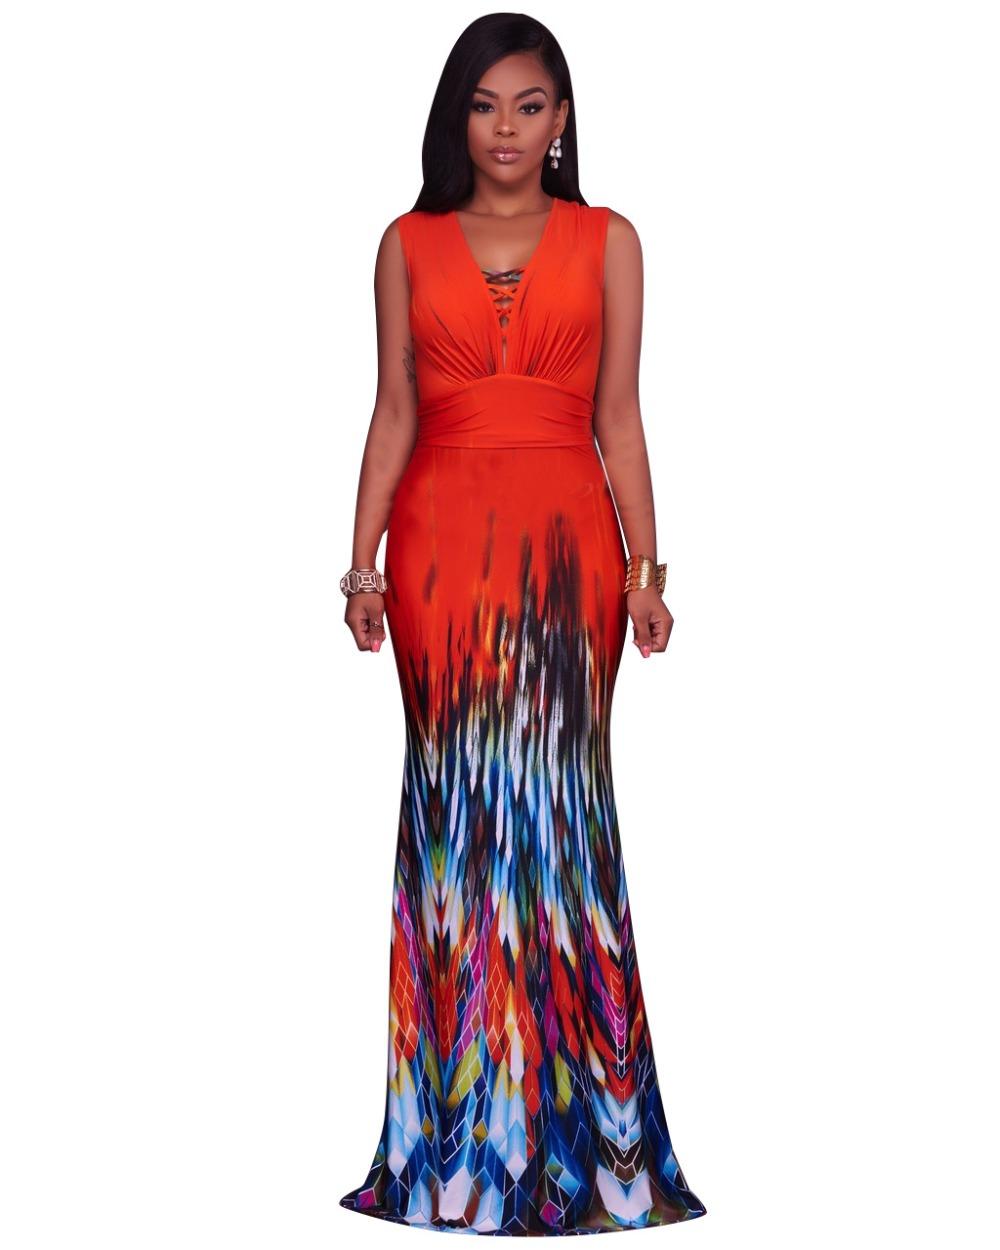 Eleanor Summer Red African Print Women Long Dress – Trendyhera